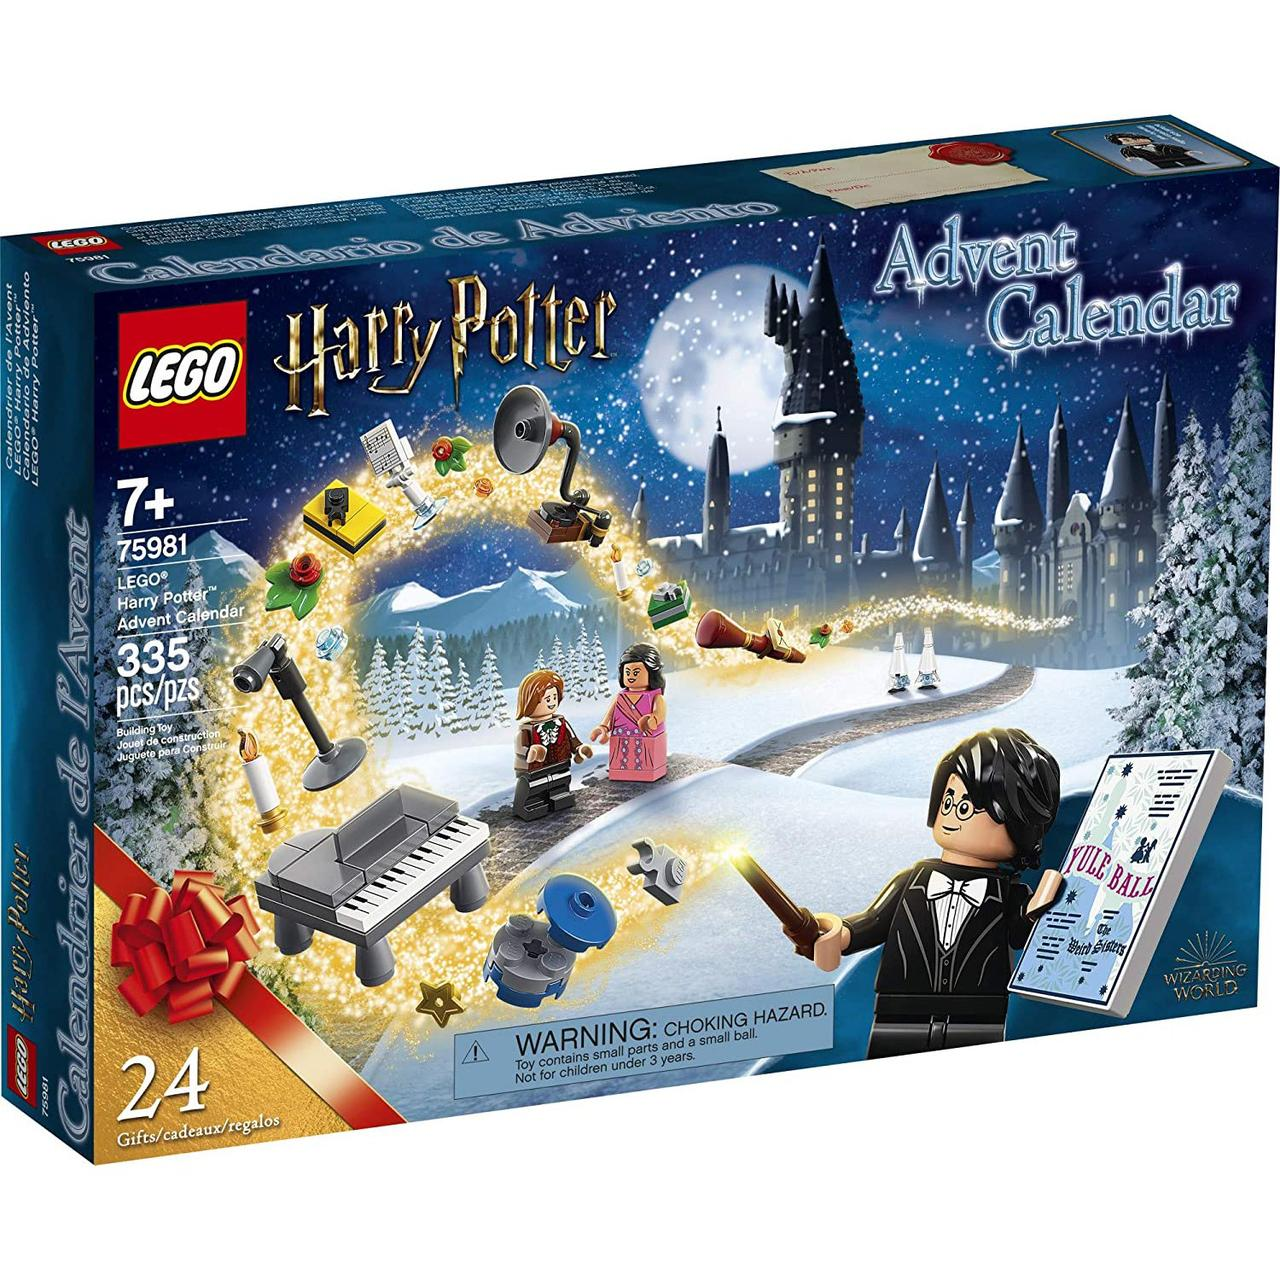 Конструктор LEGO 75981Harry Potter Новорічний календар (Новогодний адвент календарь лего Гарри Поттер)